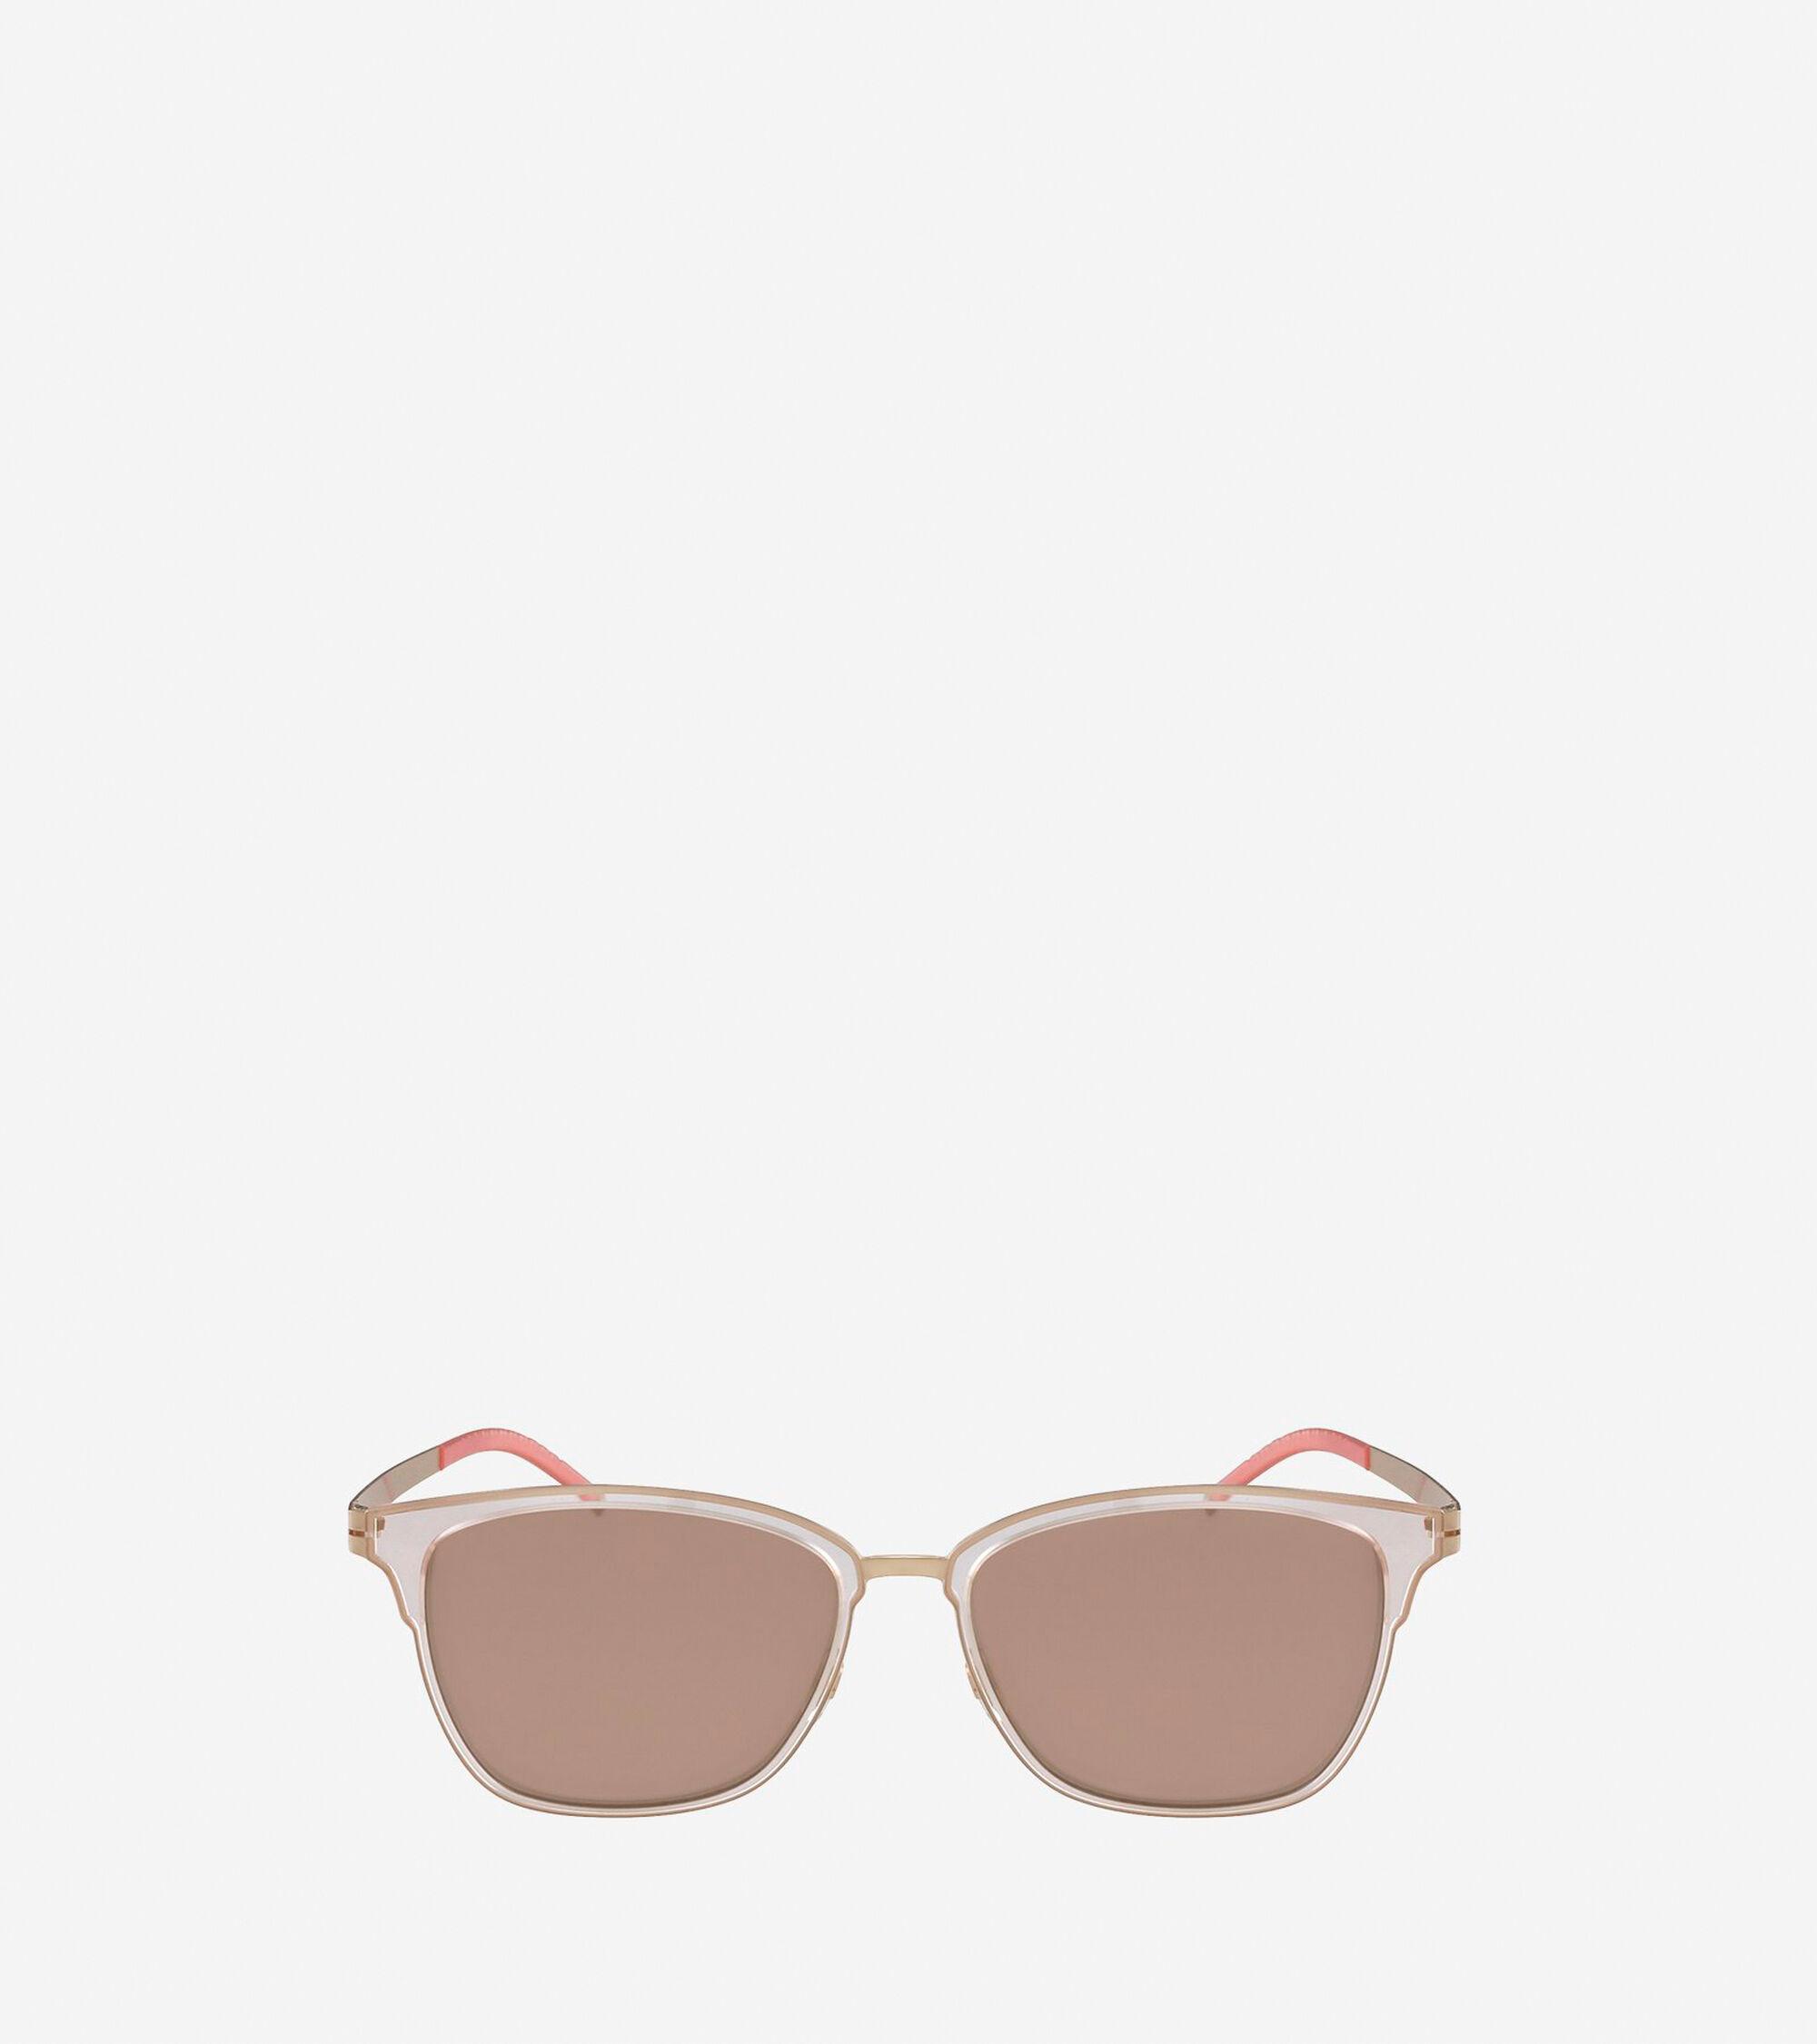 Cole Haan Women's StudioGrand Rectangle Sunglasses